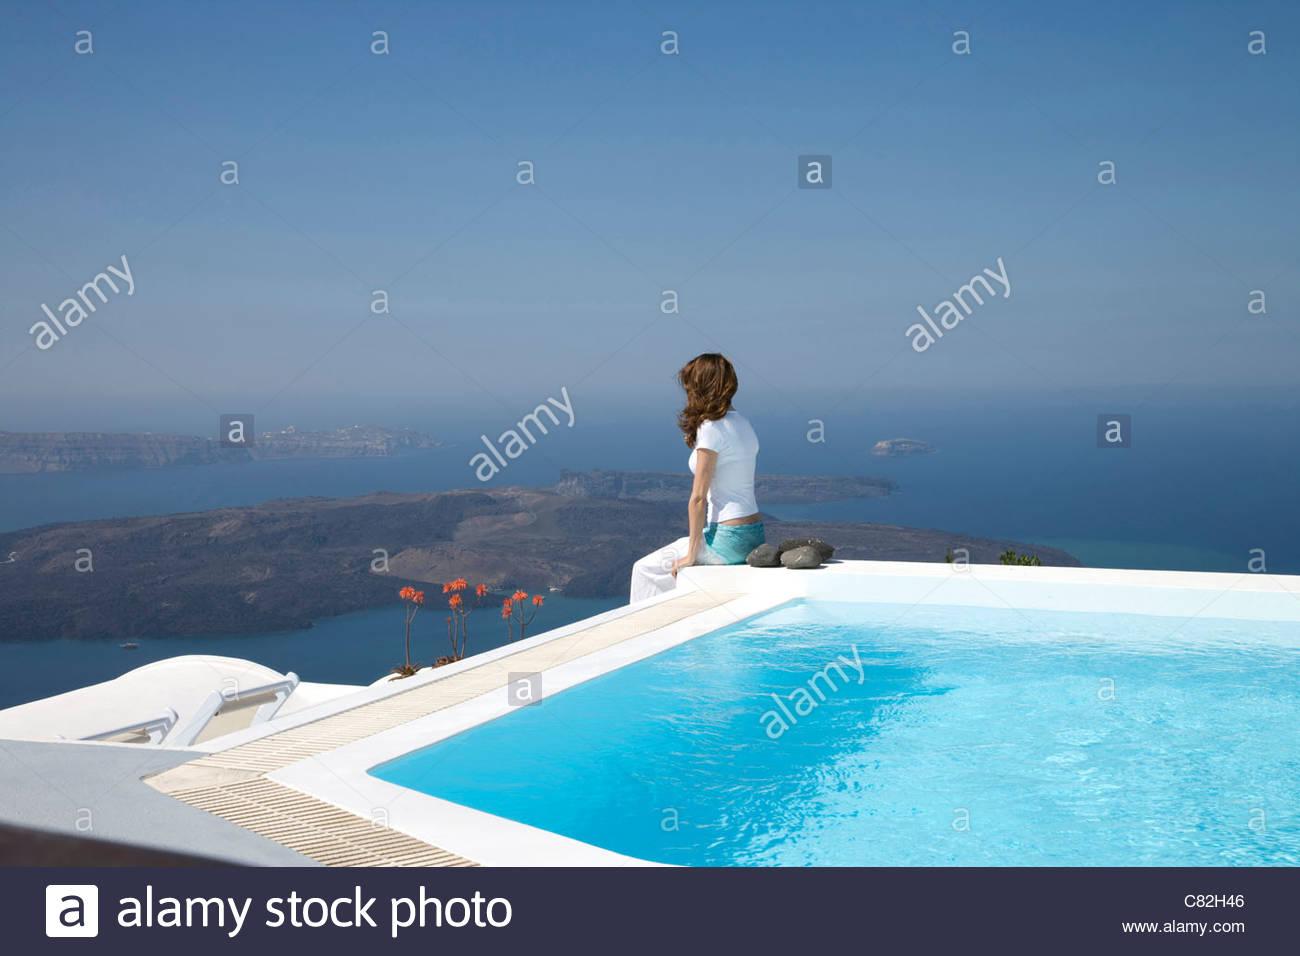 Greece, Santorini, Fira, young woman sitting by the pool - Stock Image